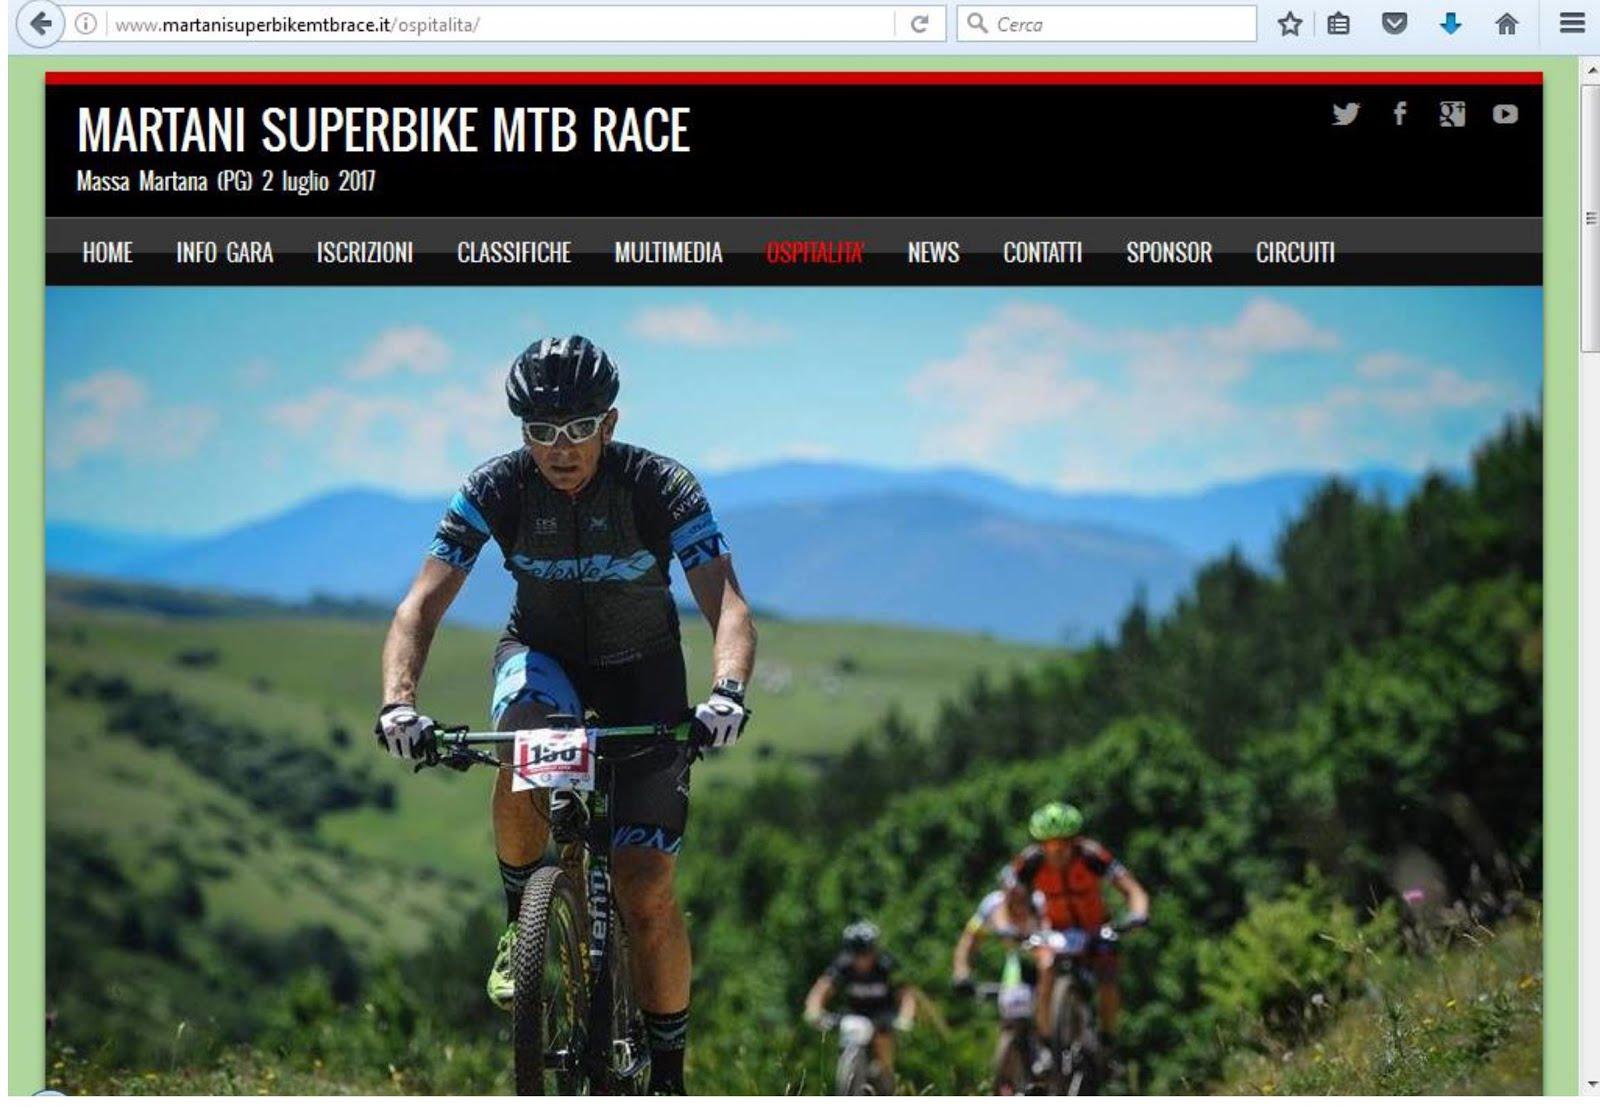 SITO UFFICIALE MARTANI SUPERBIKE MTB RACE